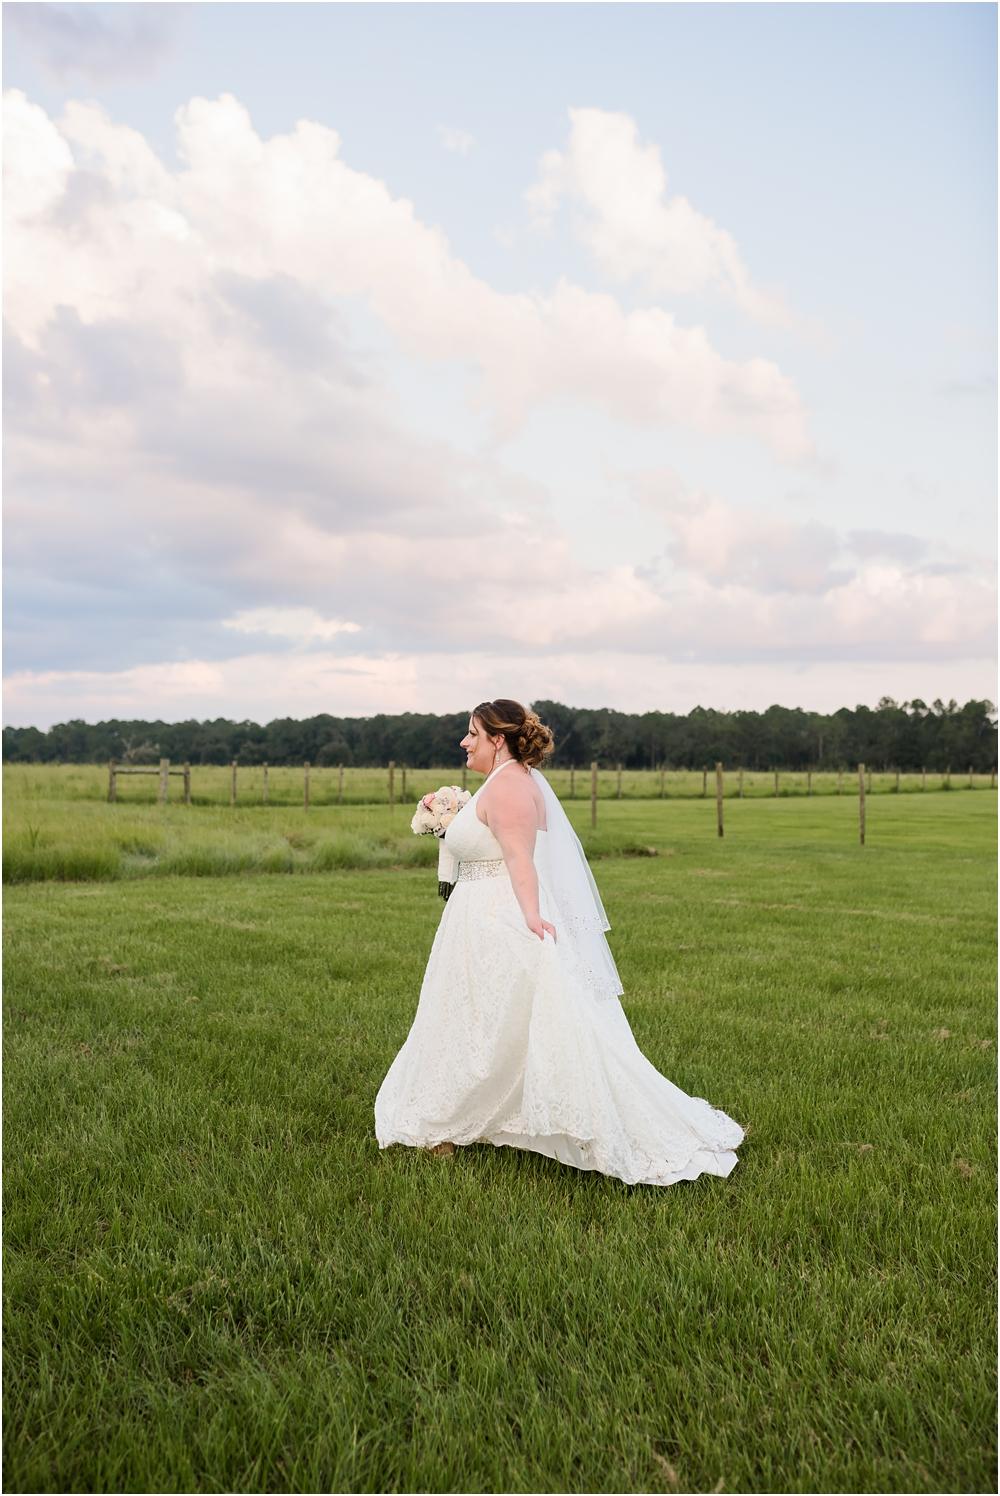 mosley-wedding-kiersten-stevenson-photography-30a-panama-city-beach-dothan-tallahassee-(279-of-472).JPG